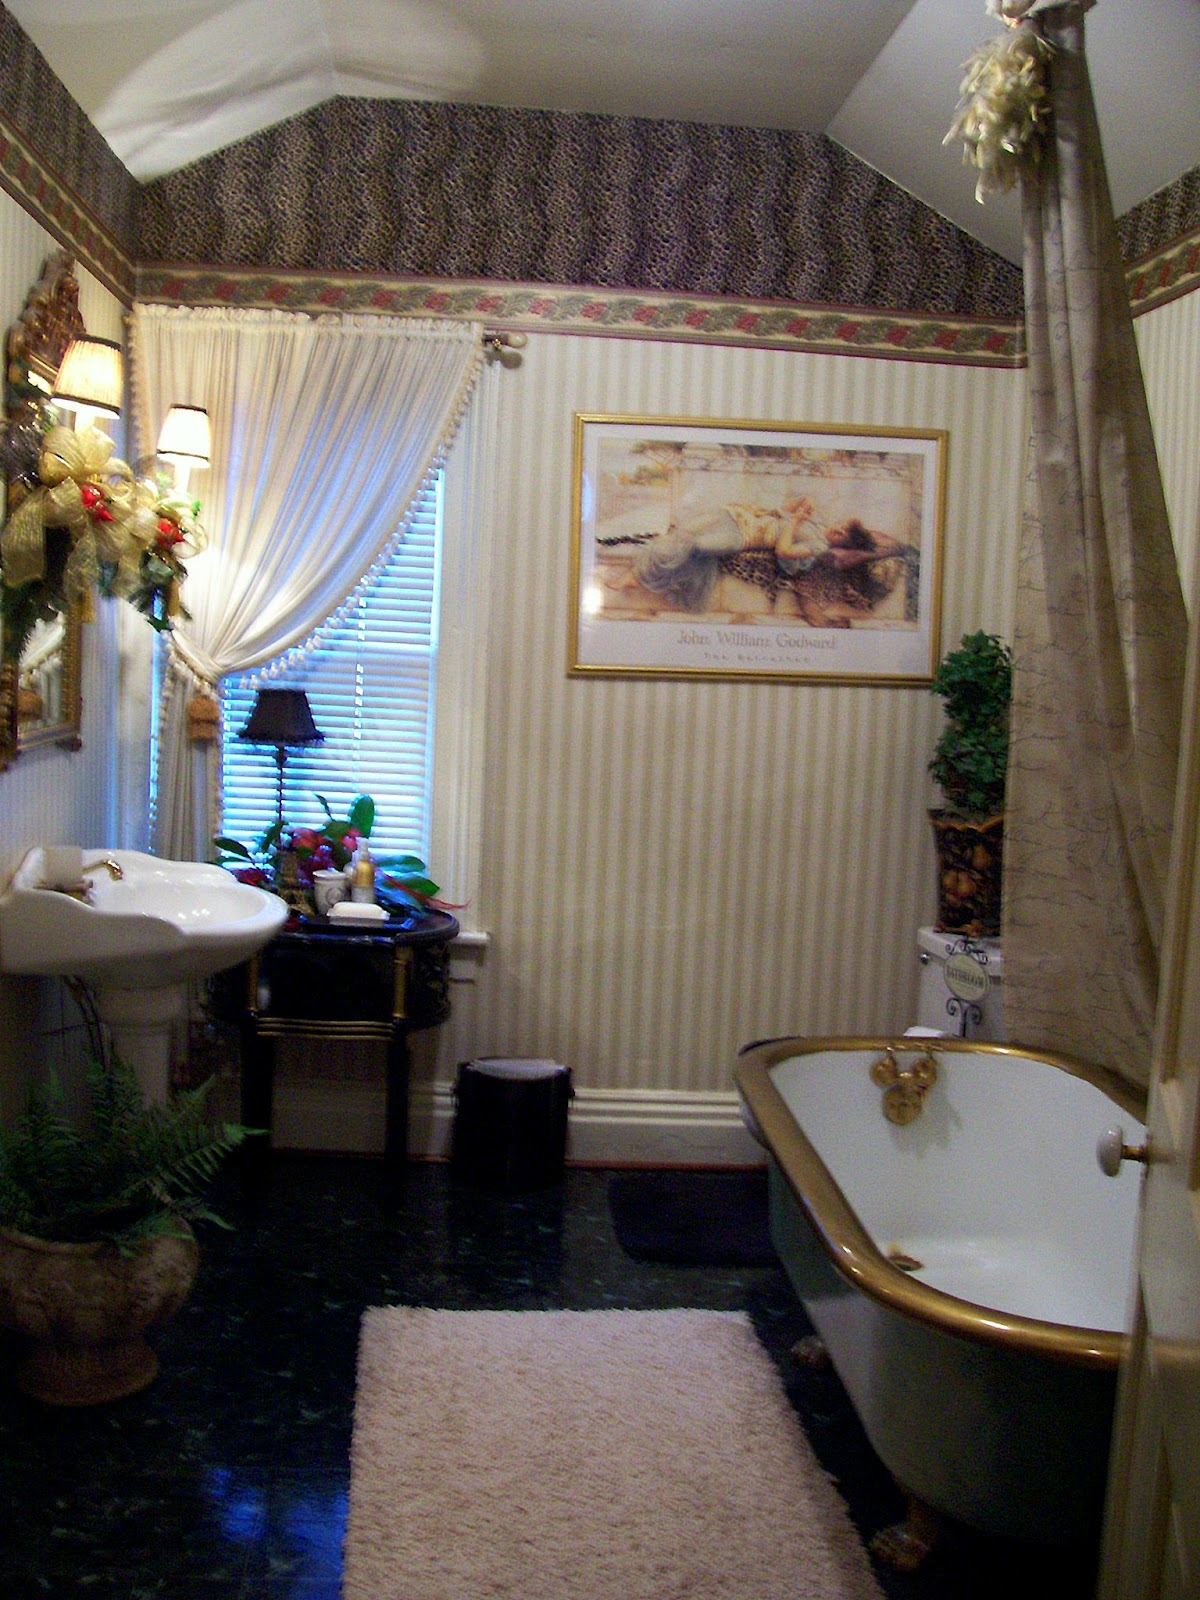 http://4.bp.blogspot.com/-iexjeEzF2LM/T8rZK-_s7BI/AAAAAAAAAfM/BtXo_9typaY/s1600/(Number%2B1)Bathroom%2B2.JPG